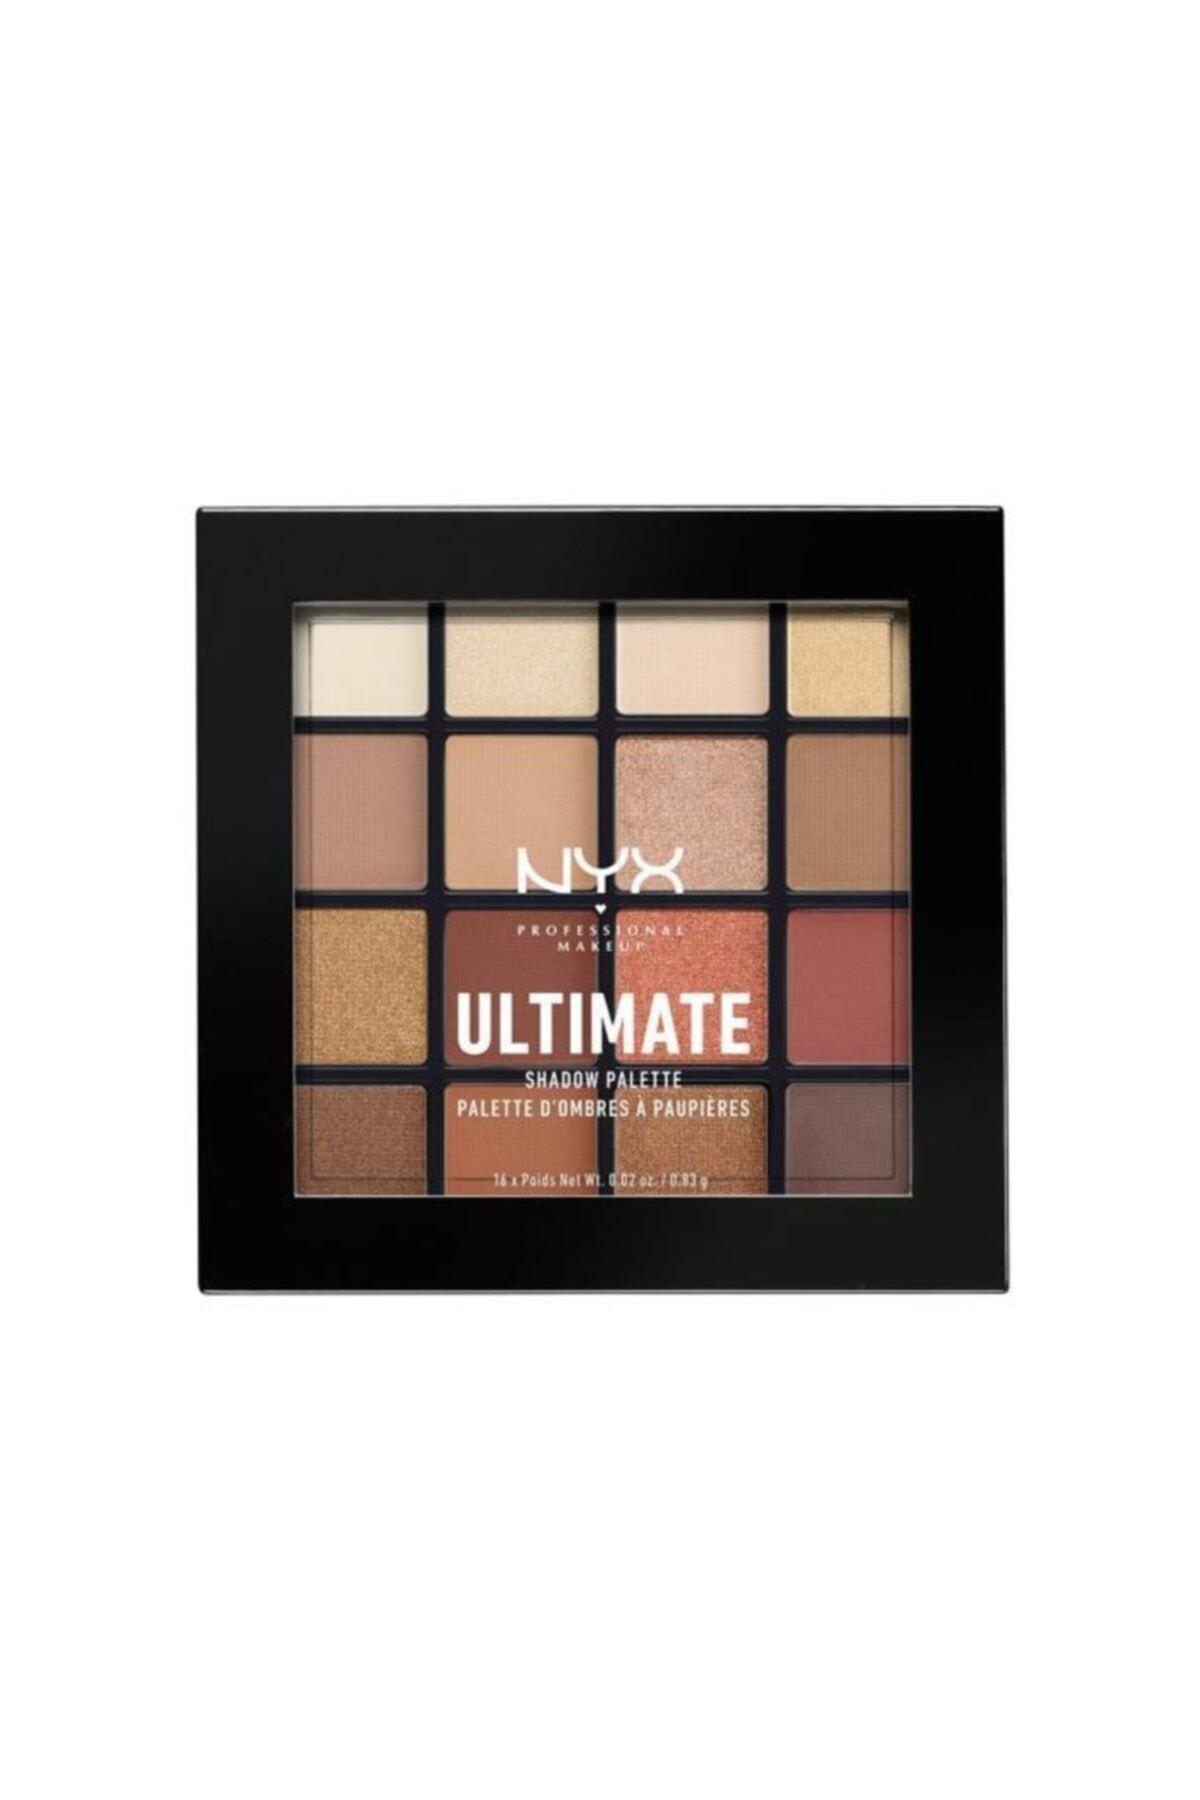 NYX Professional Makeup Pubgm Ultimate Shadow Palette Warm Neutrals - Far Paleti 2